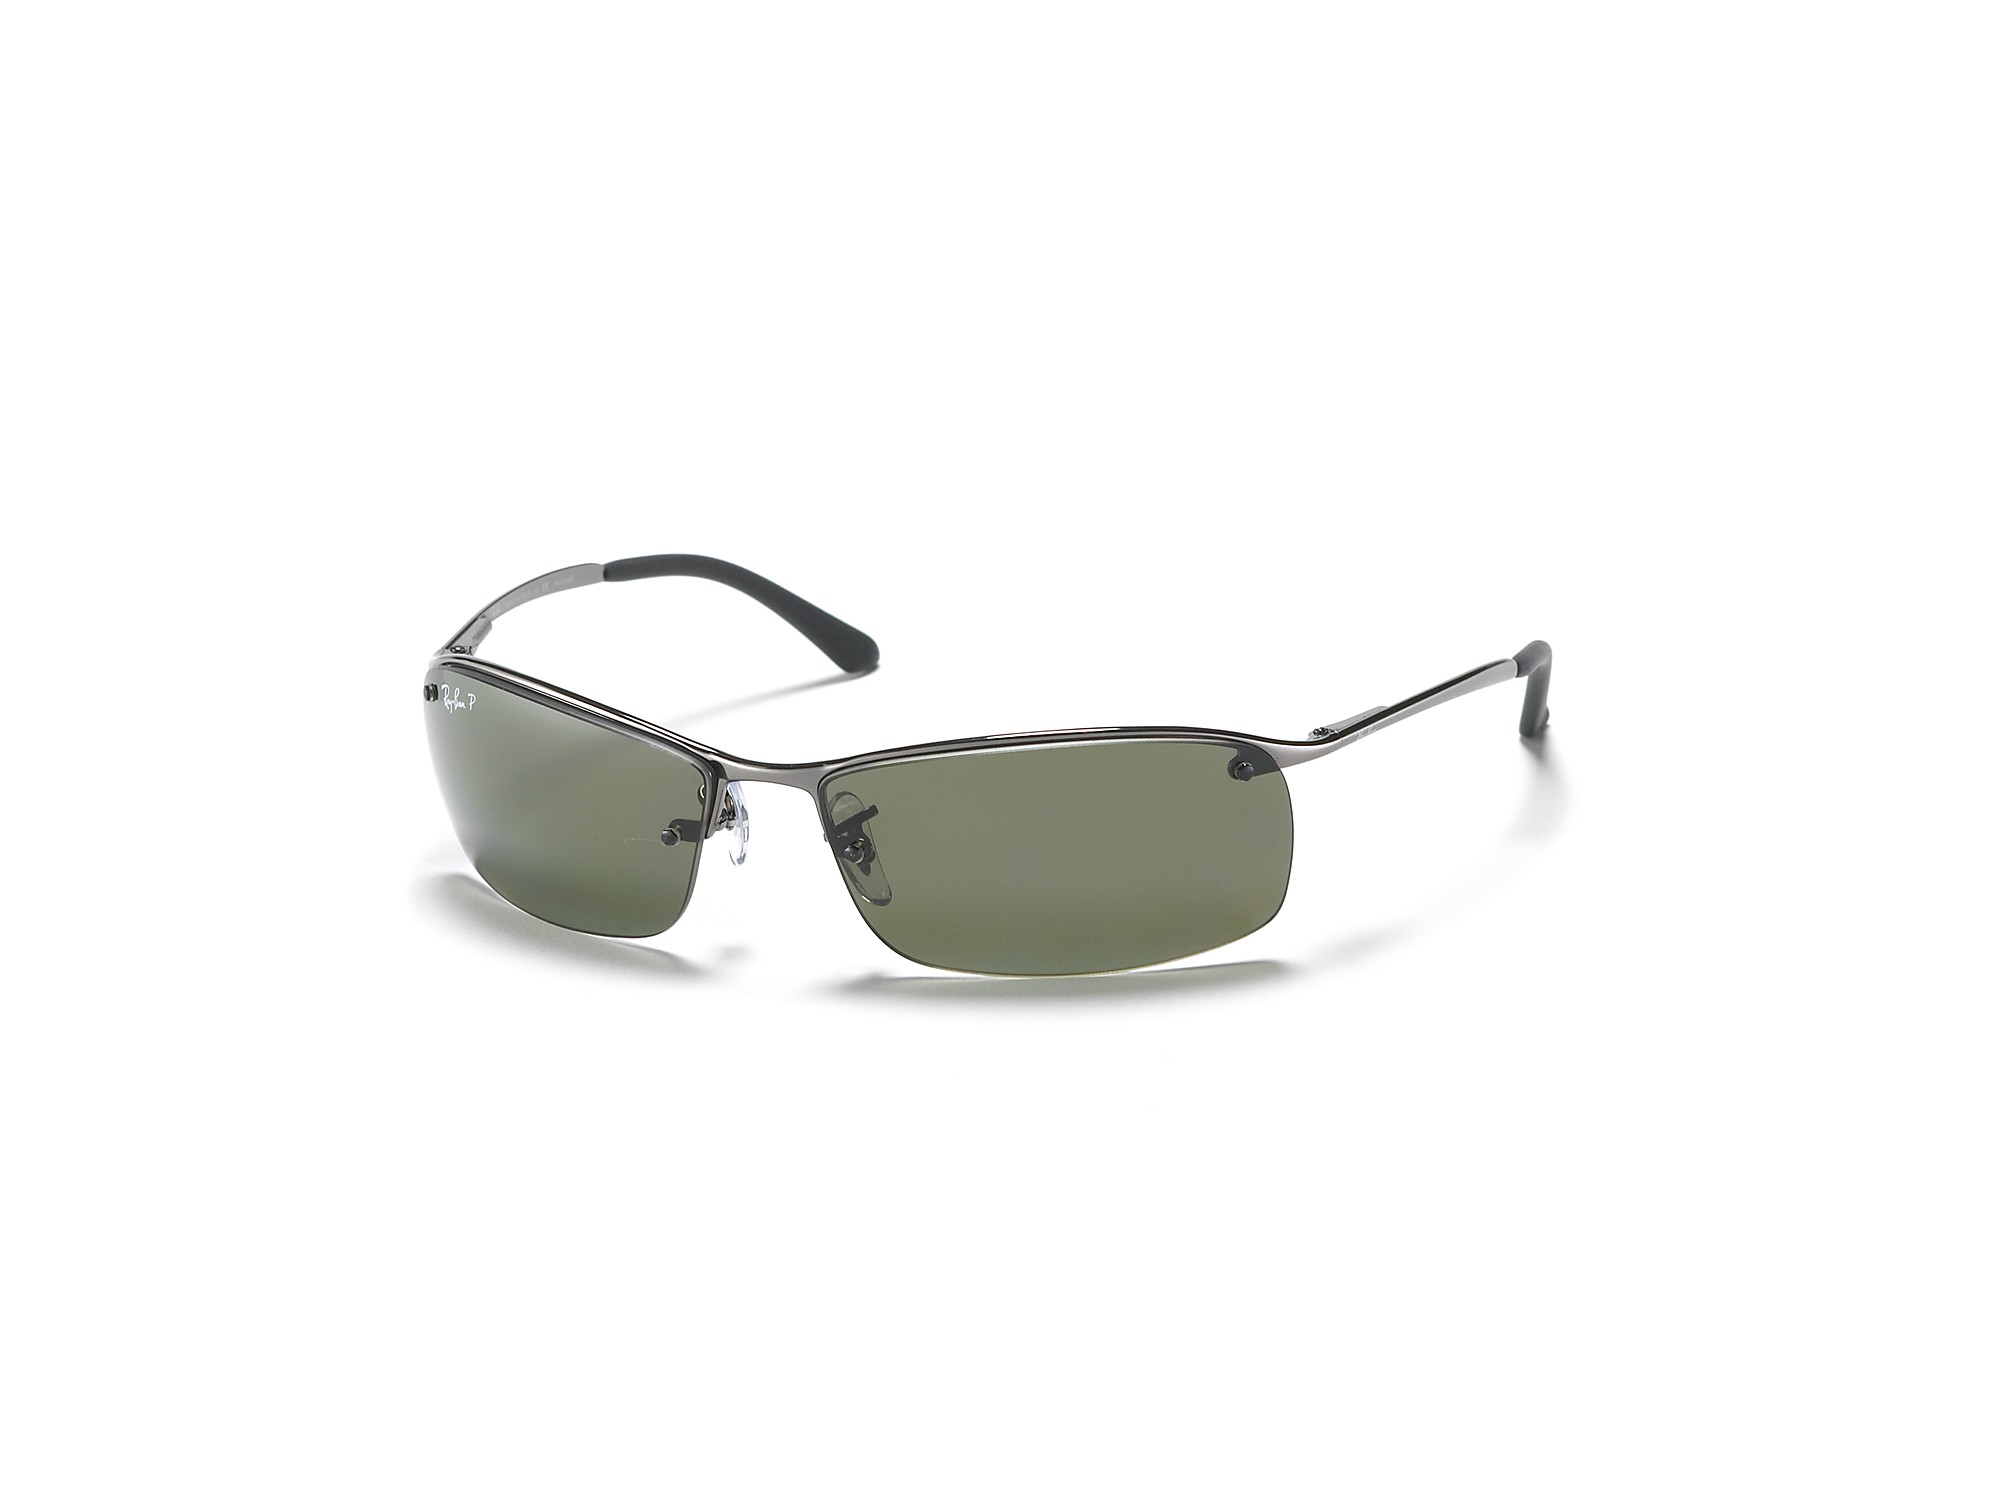 Rimless Polarized Sunglasses : Ray-ban Rimless Bottom Polarized Sunglasses in Gray for ...